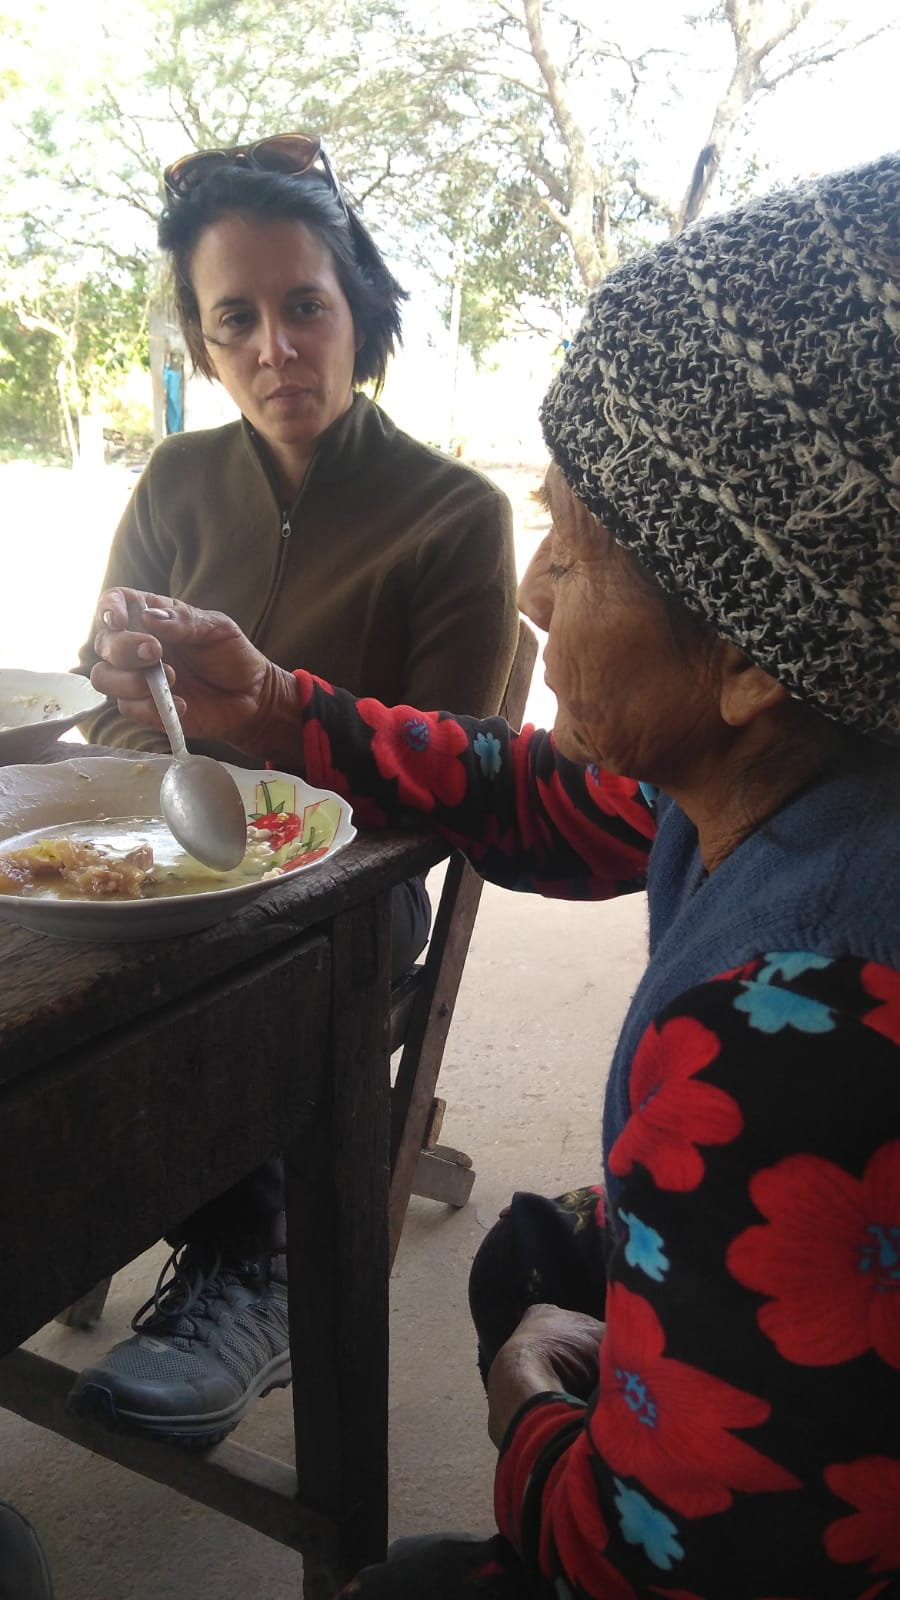 Doña Lindaura shares her story with CWS program officer Agustina Ramos.